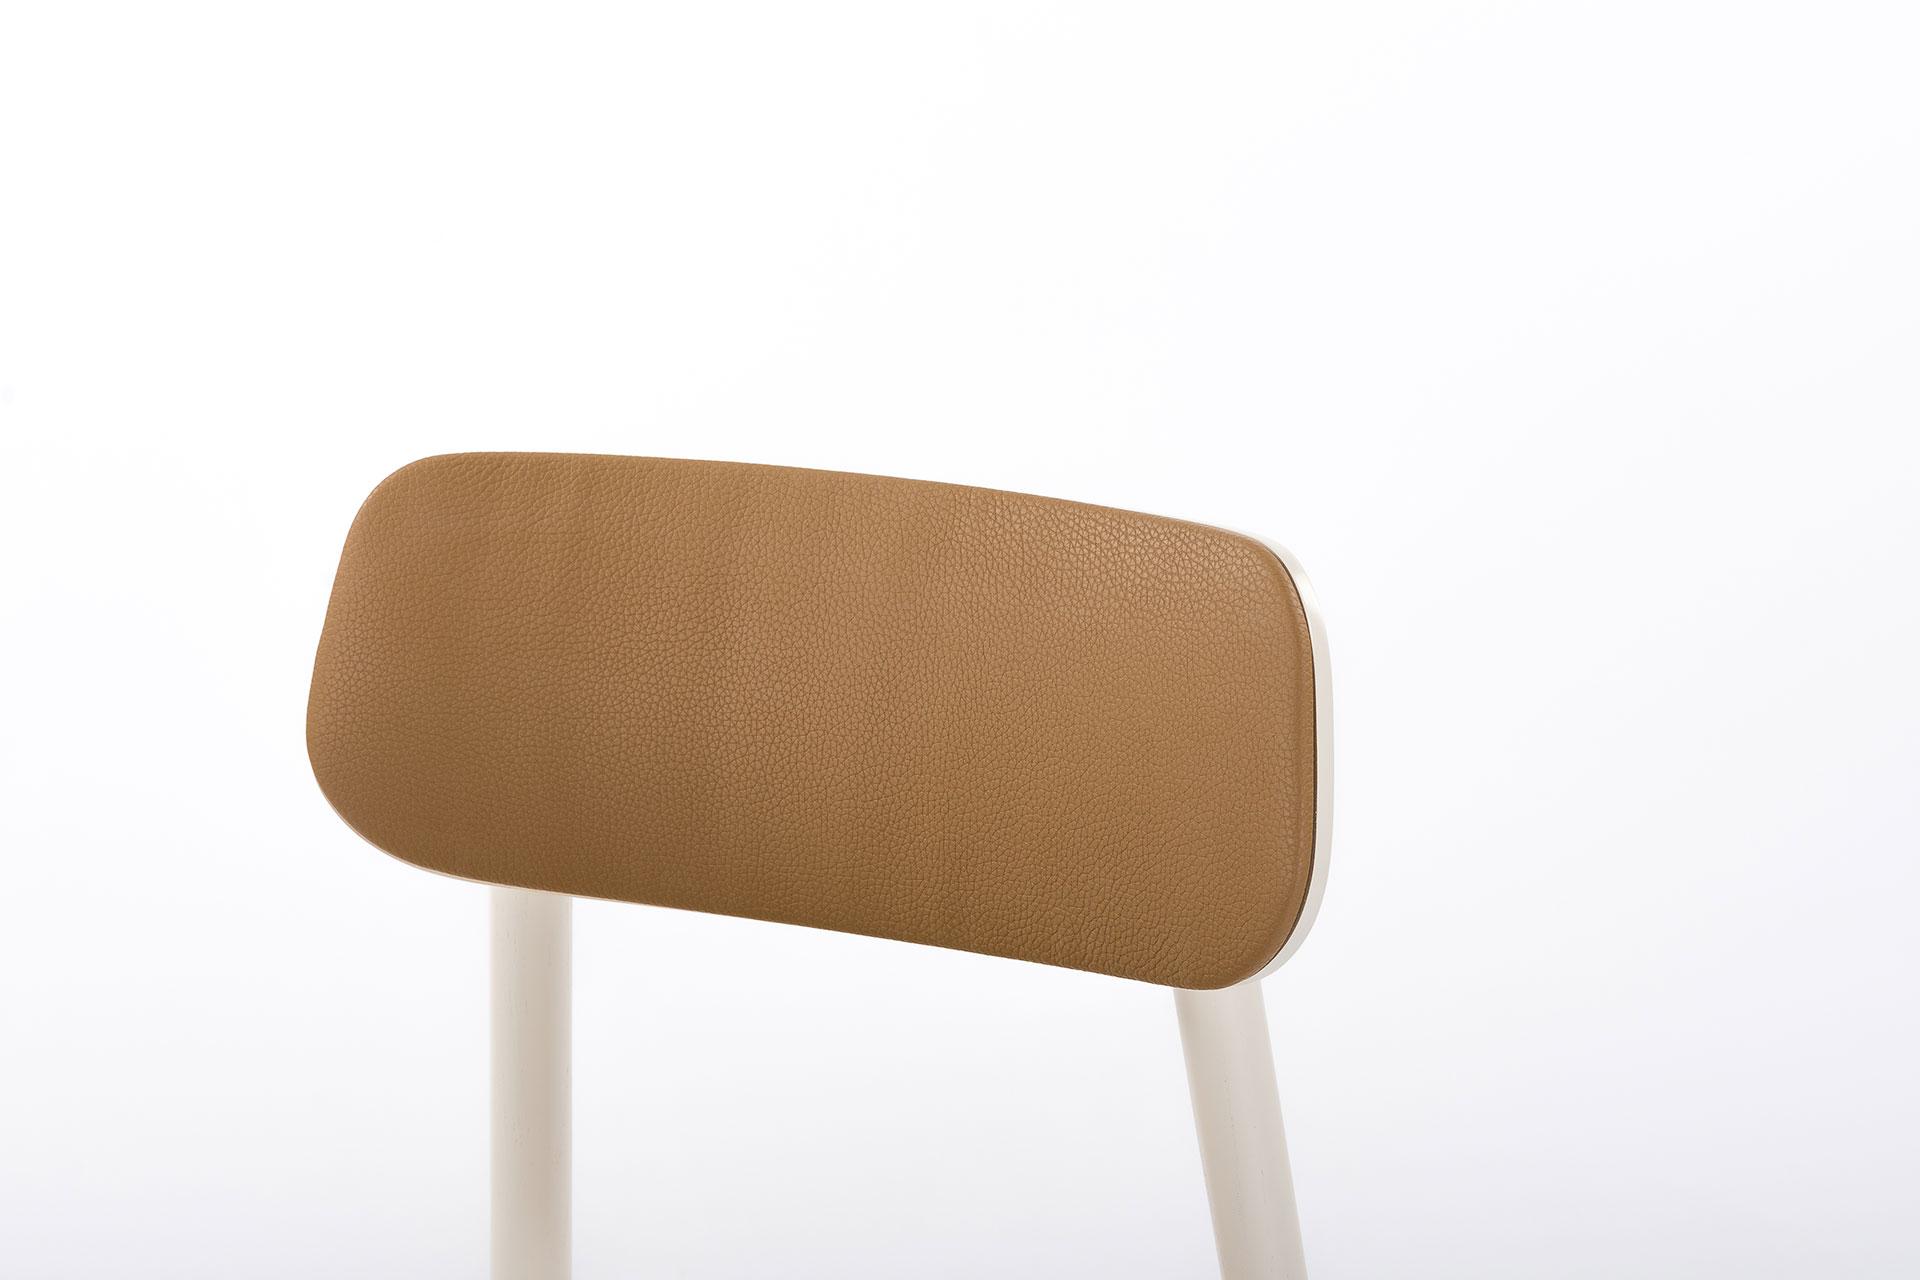 Спинка кухонного стула Х, с мягкой оббивкой коричневого цвета